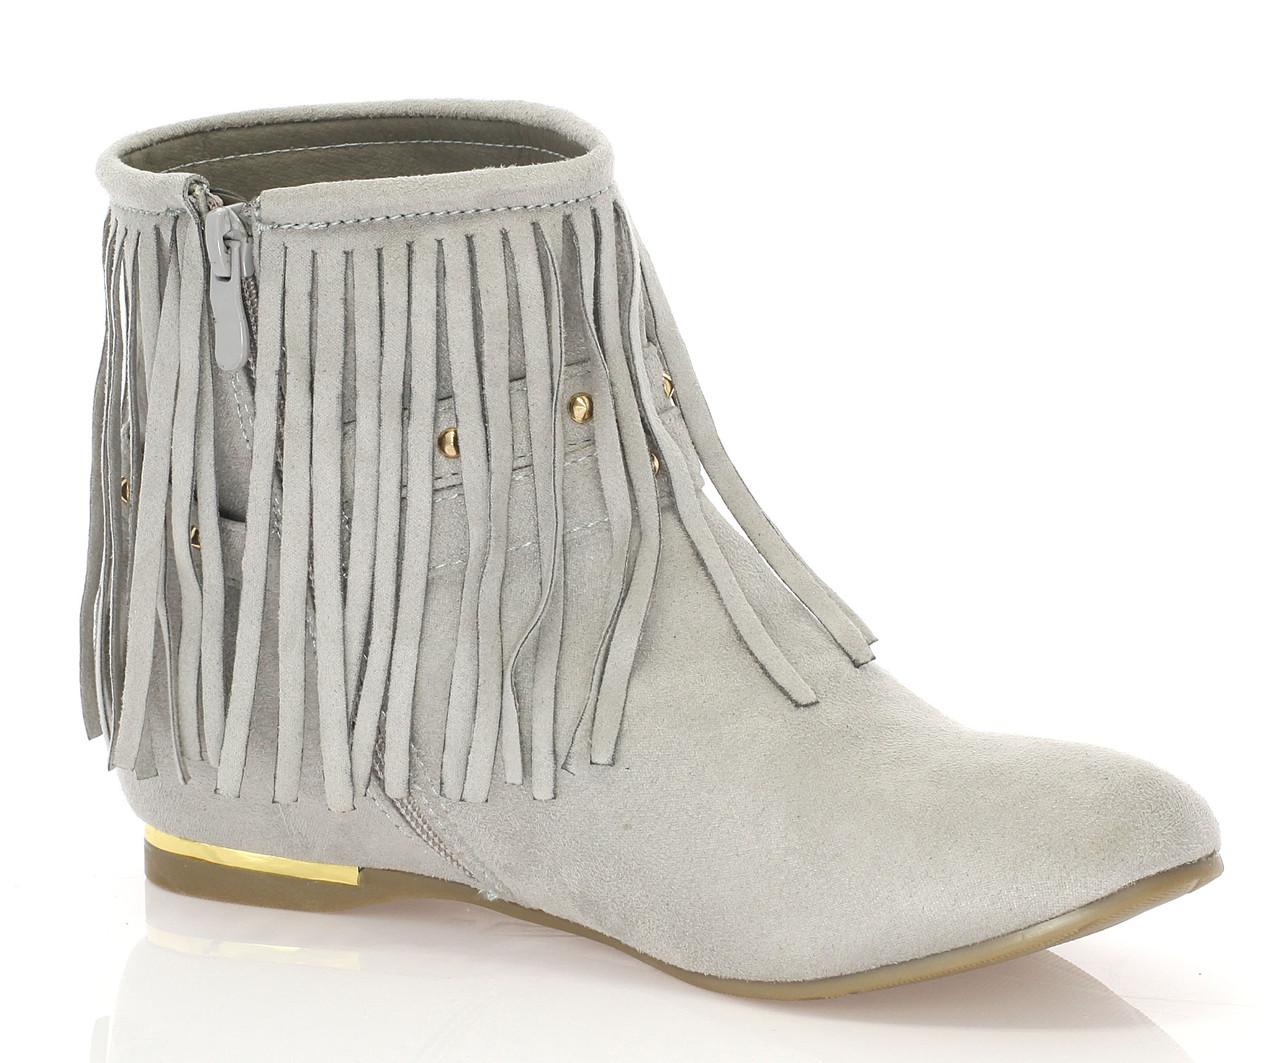 Женские ботинки Clementine grey